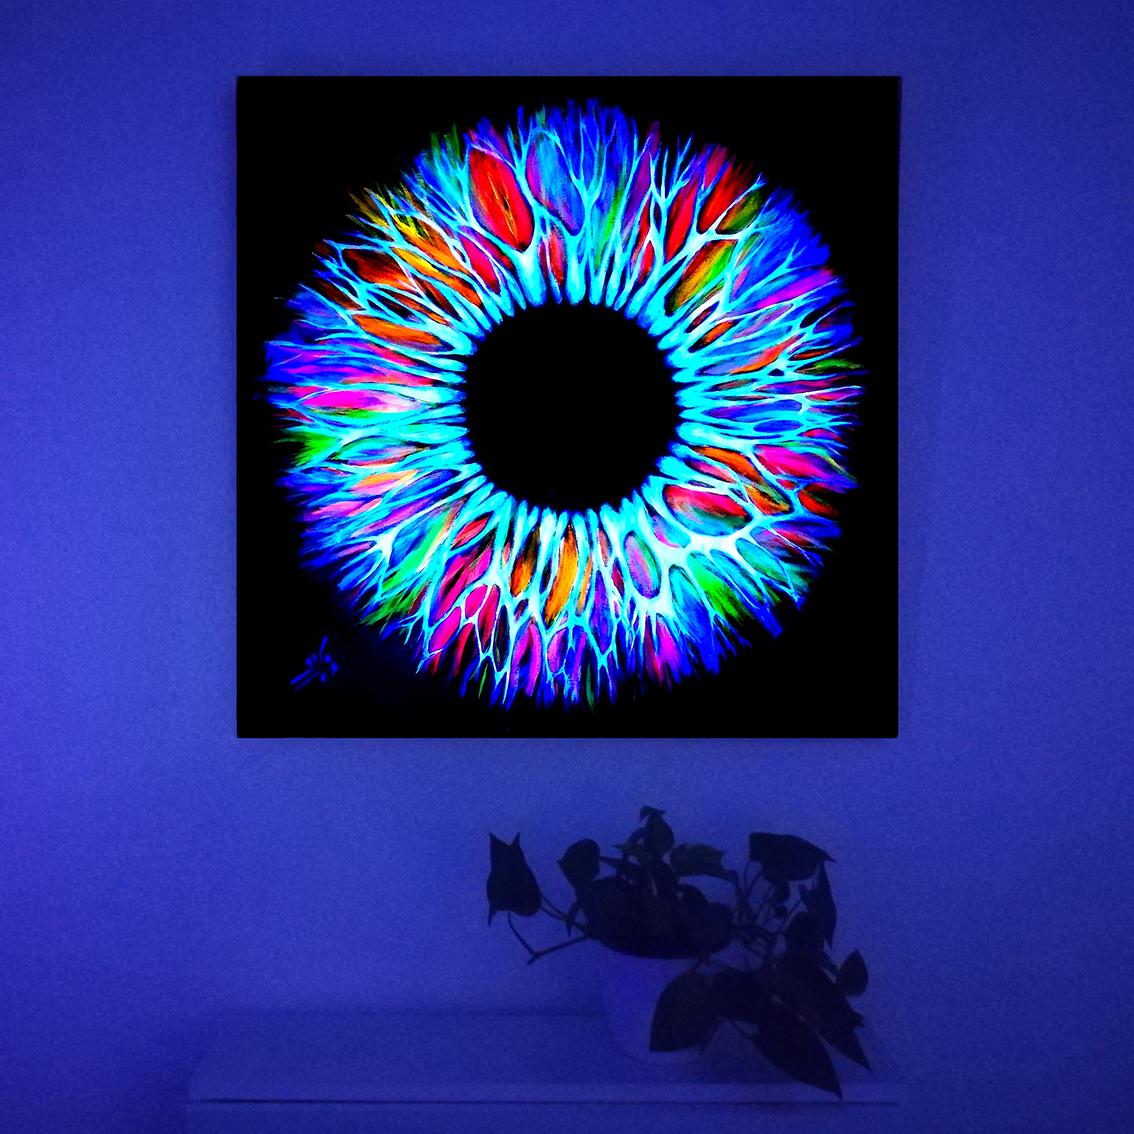 Vicky-Casellas.-Iris-fluorescente.-Arte-fluorescente.-80x80-cm.-Acrílico-sobre-lienzo